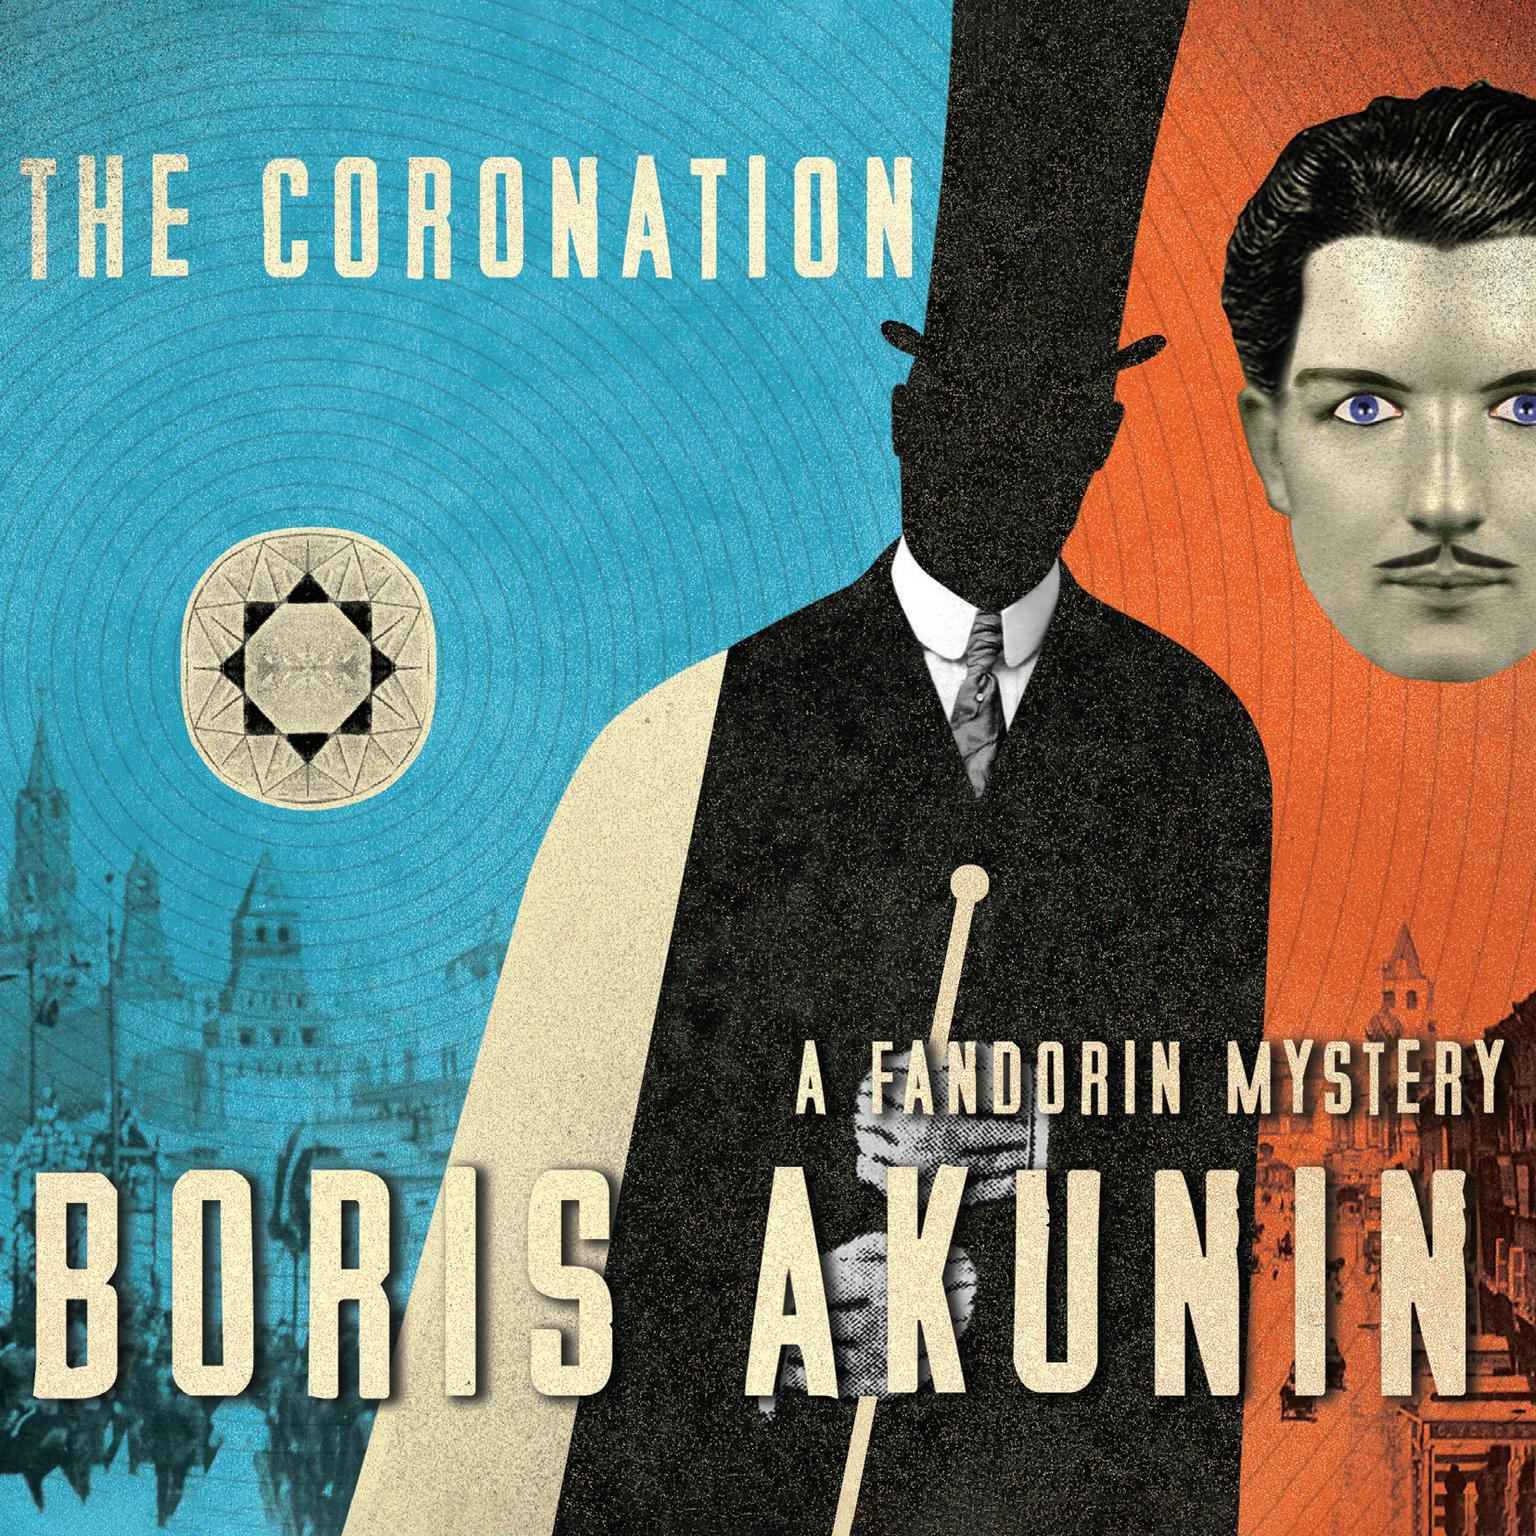 Printable The Coronation: A Fandorin Mystery Audiobook Cover Art